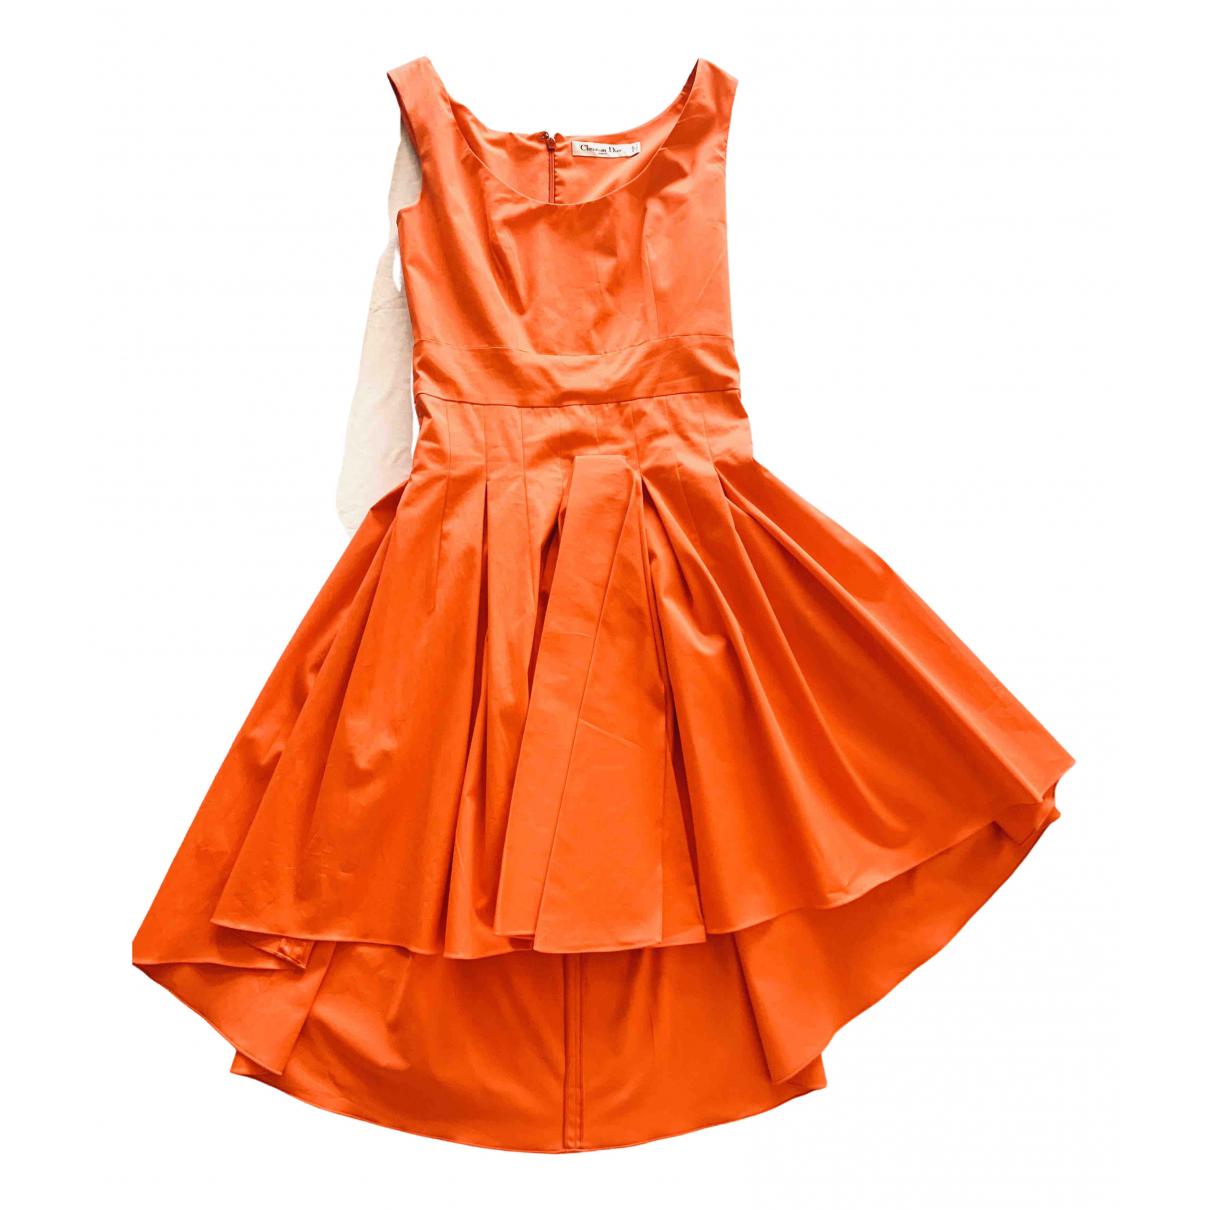 Dior \N Orange Cotton dress for Women 38 FR